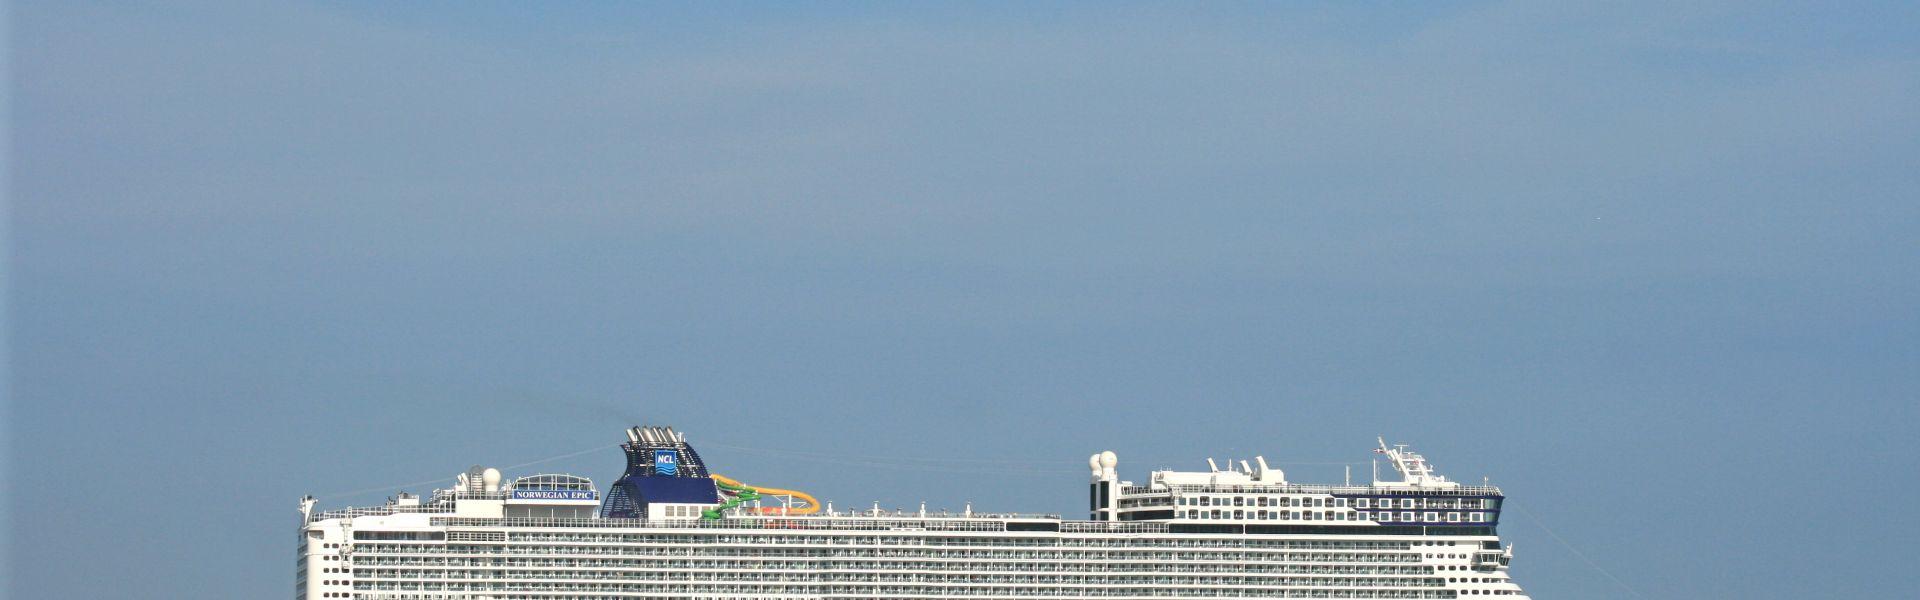 Croaziera 2017 - Mediterana de Vest (Civitavecchia) - Norwegian Cruise Line - Norwegian Epic - 7 nopti